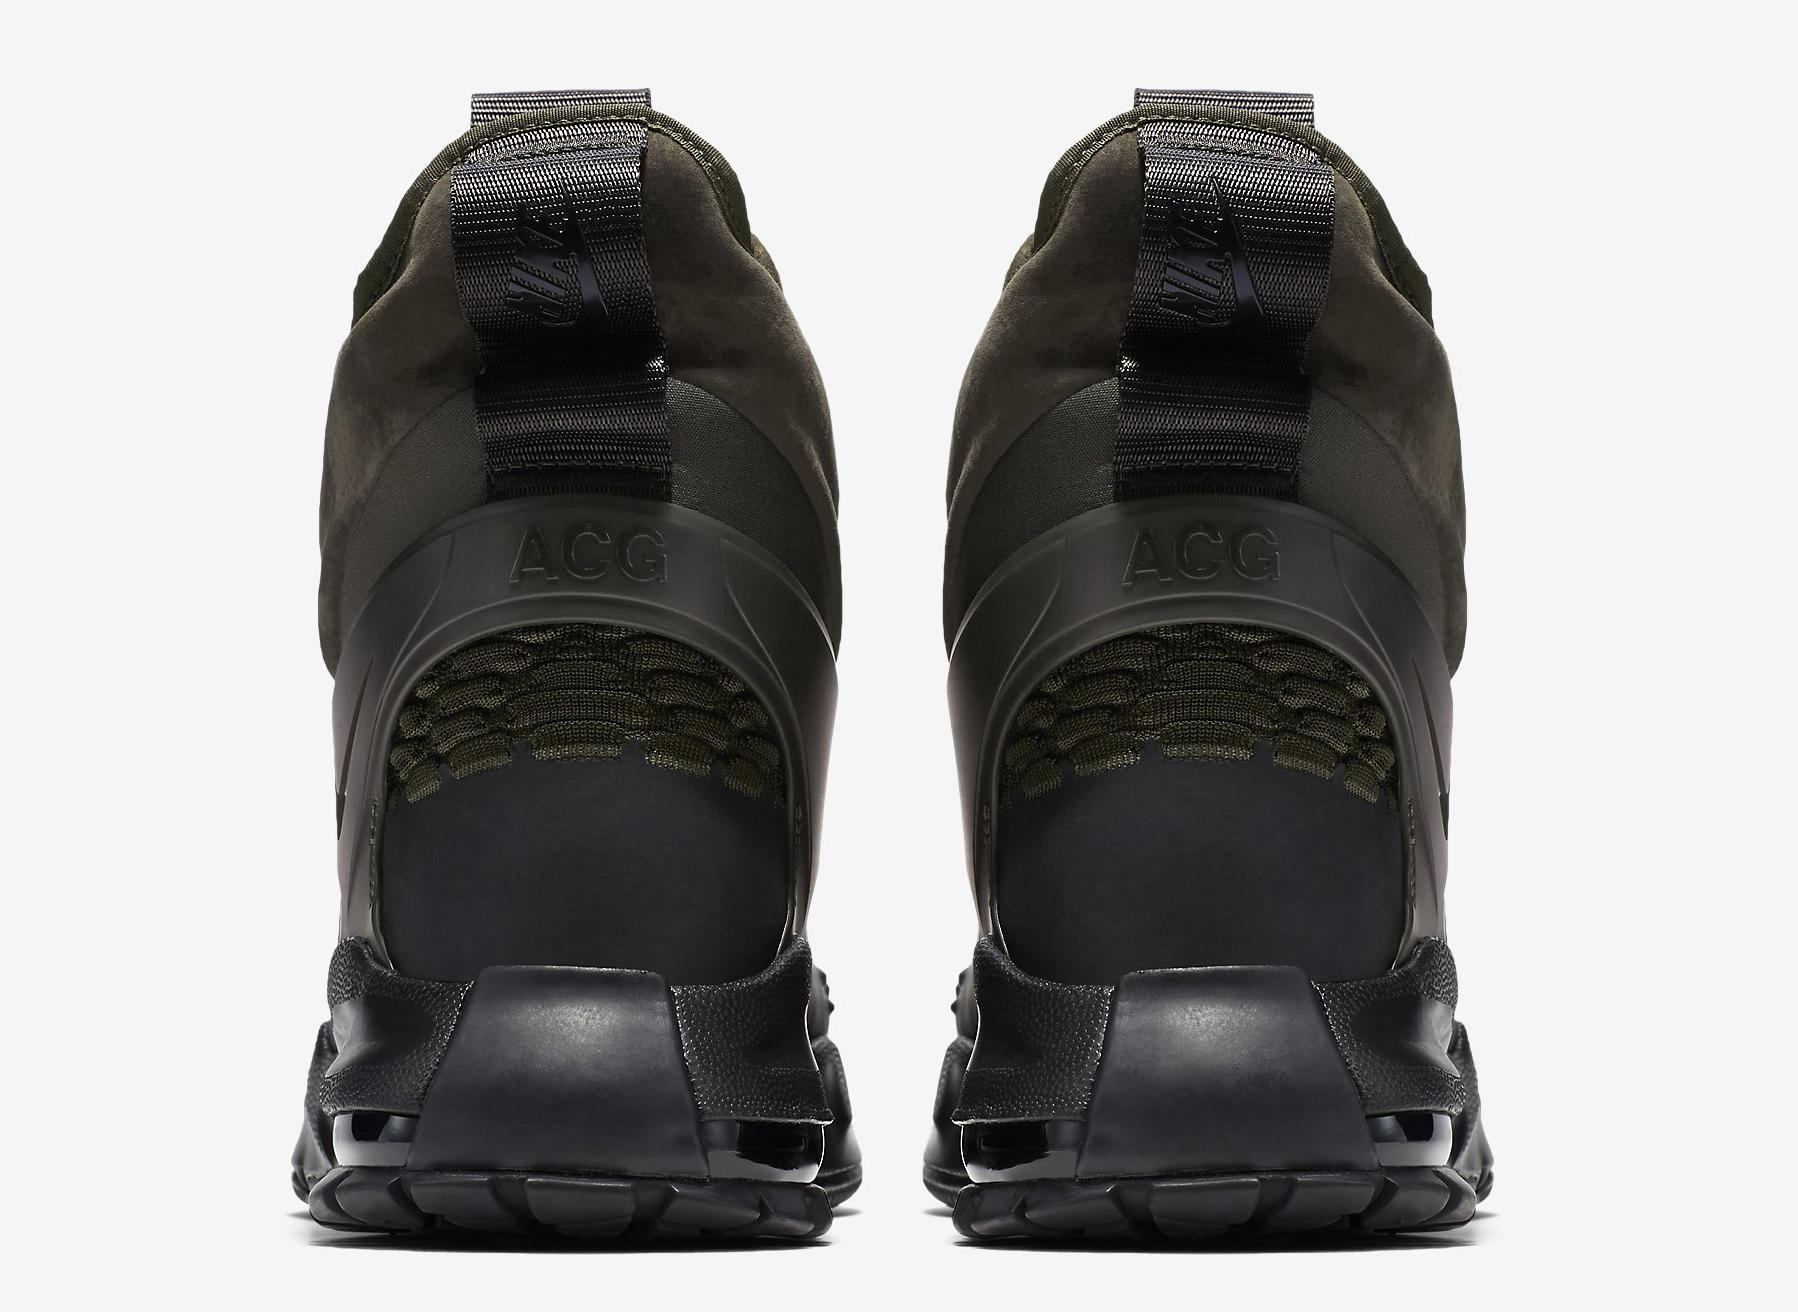 1018d9179f8d Image via Nike NikeLab Air Zoom Tallac Flyknit 865947-002 Olive Heel